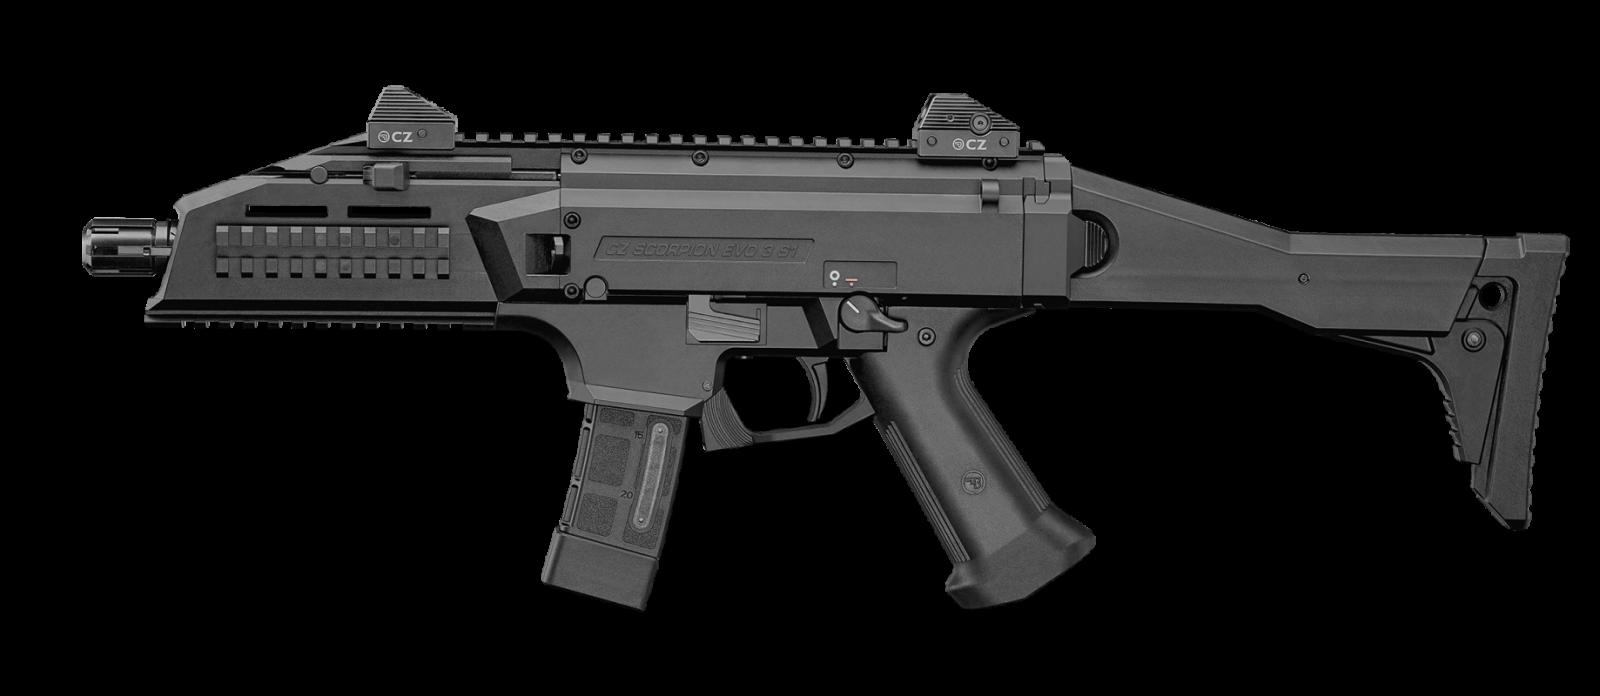 Carabine CZ Scorpion Evo3 S1 Cal. 9x19